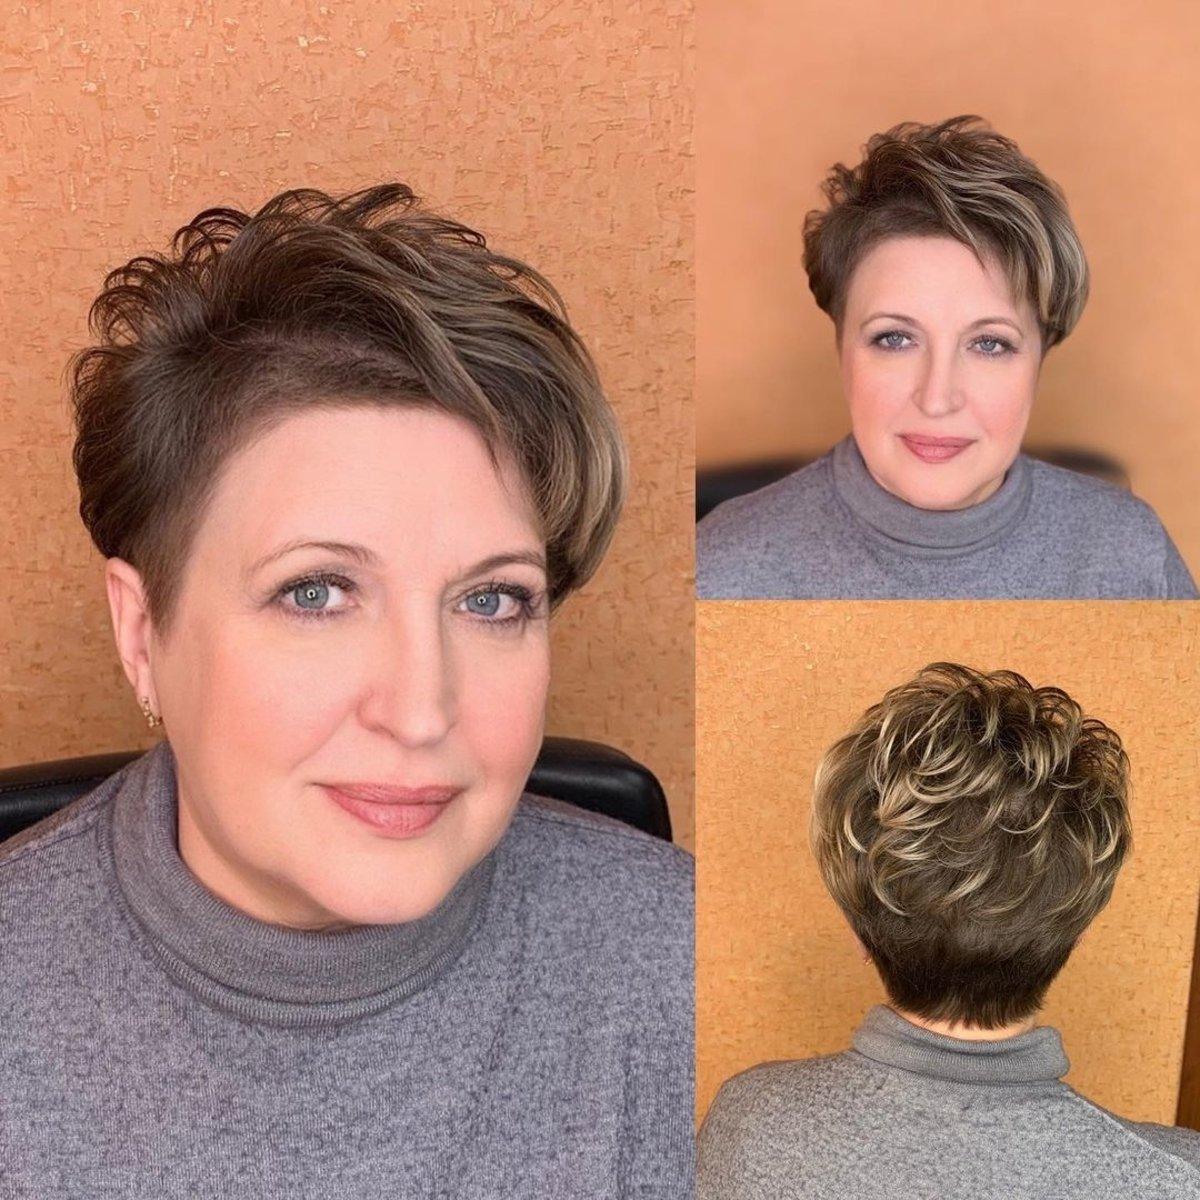 Pixie bob corto y atrevido para mujeres con cabello fino